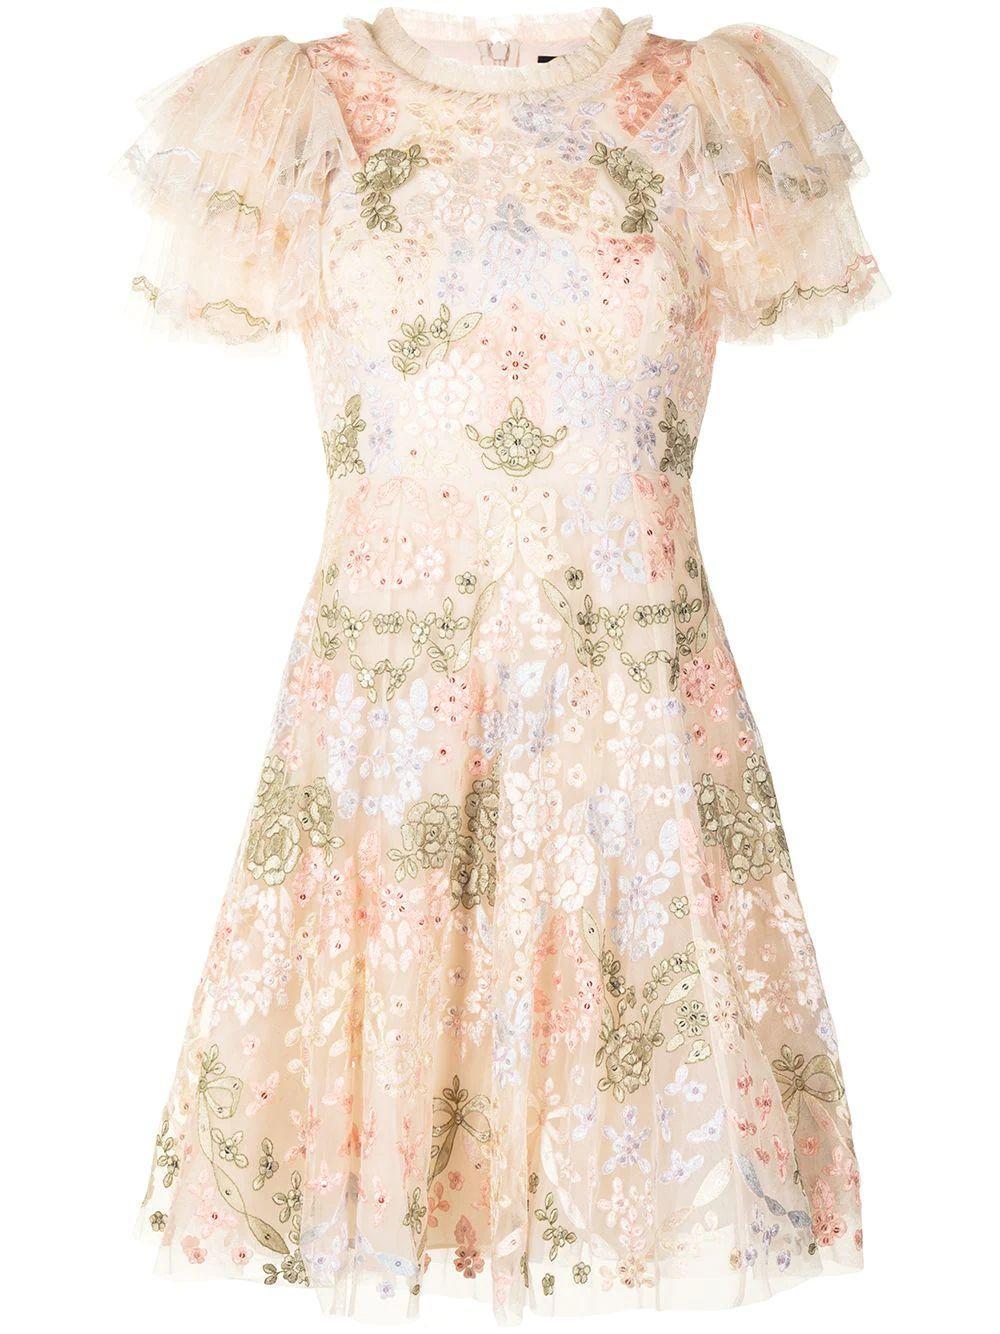 Elin Blossom Mini Dress